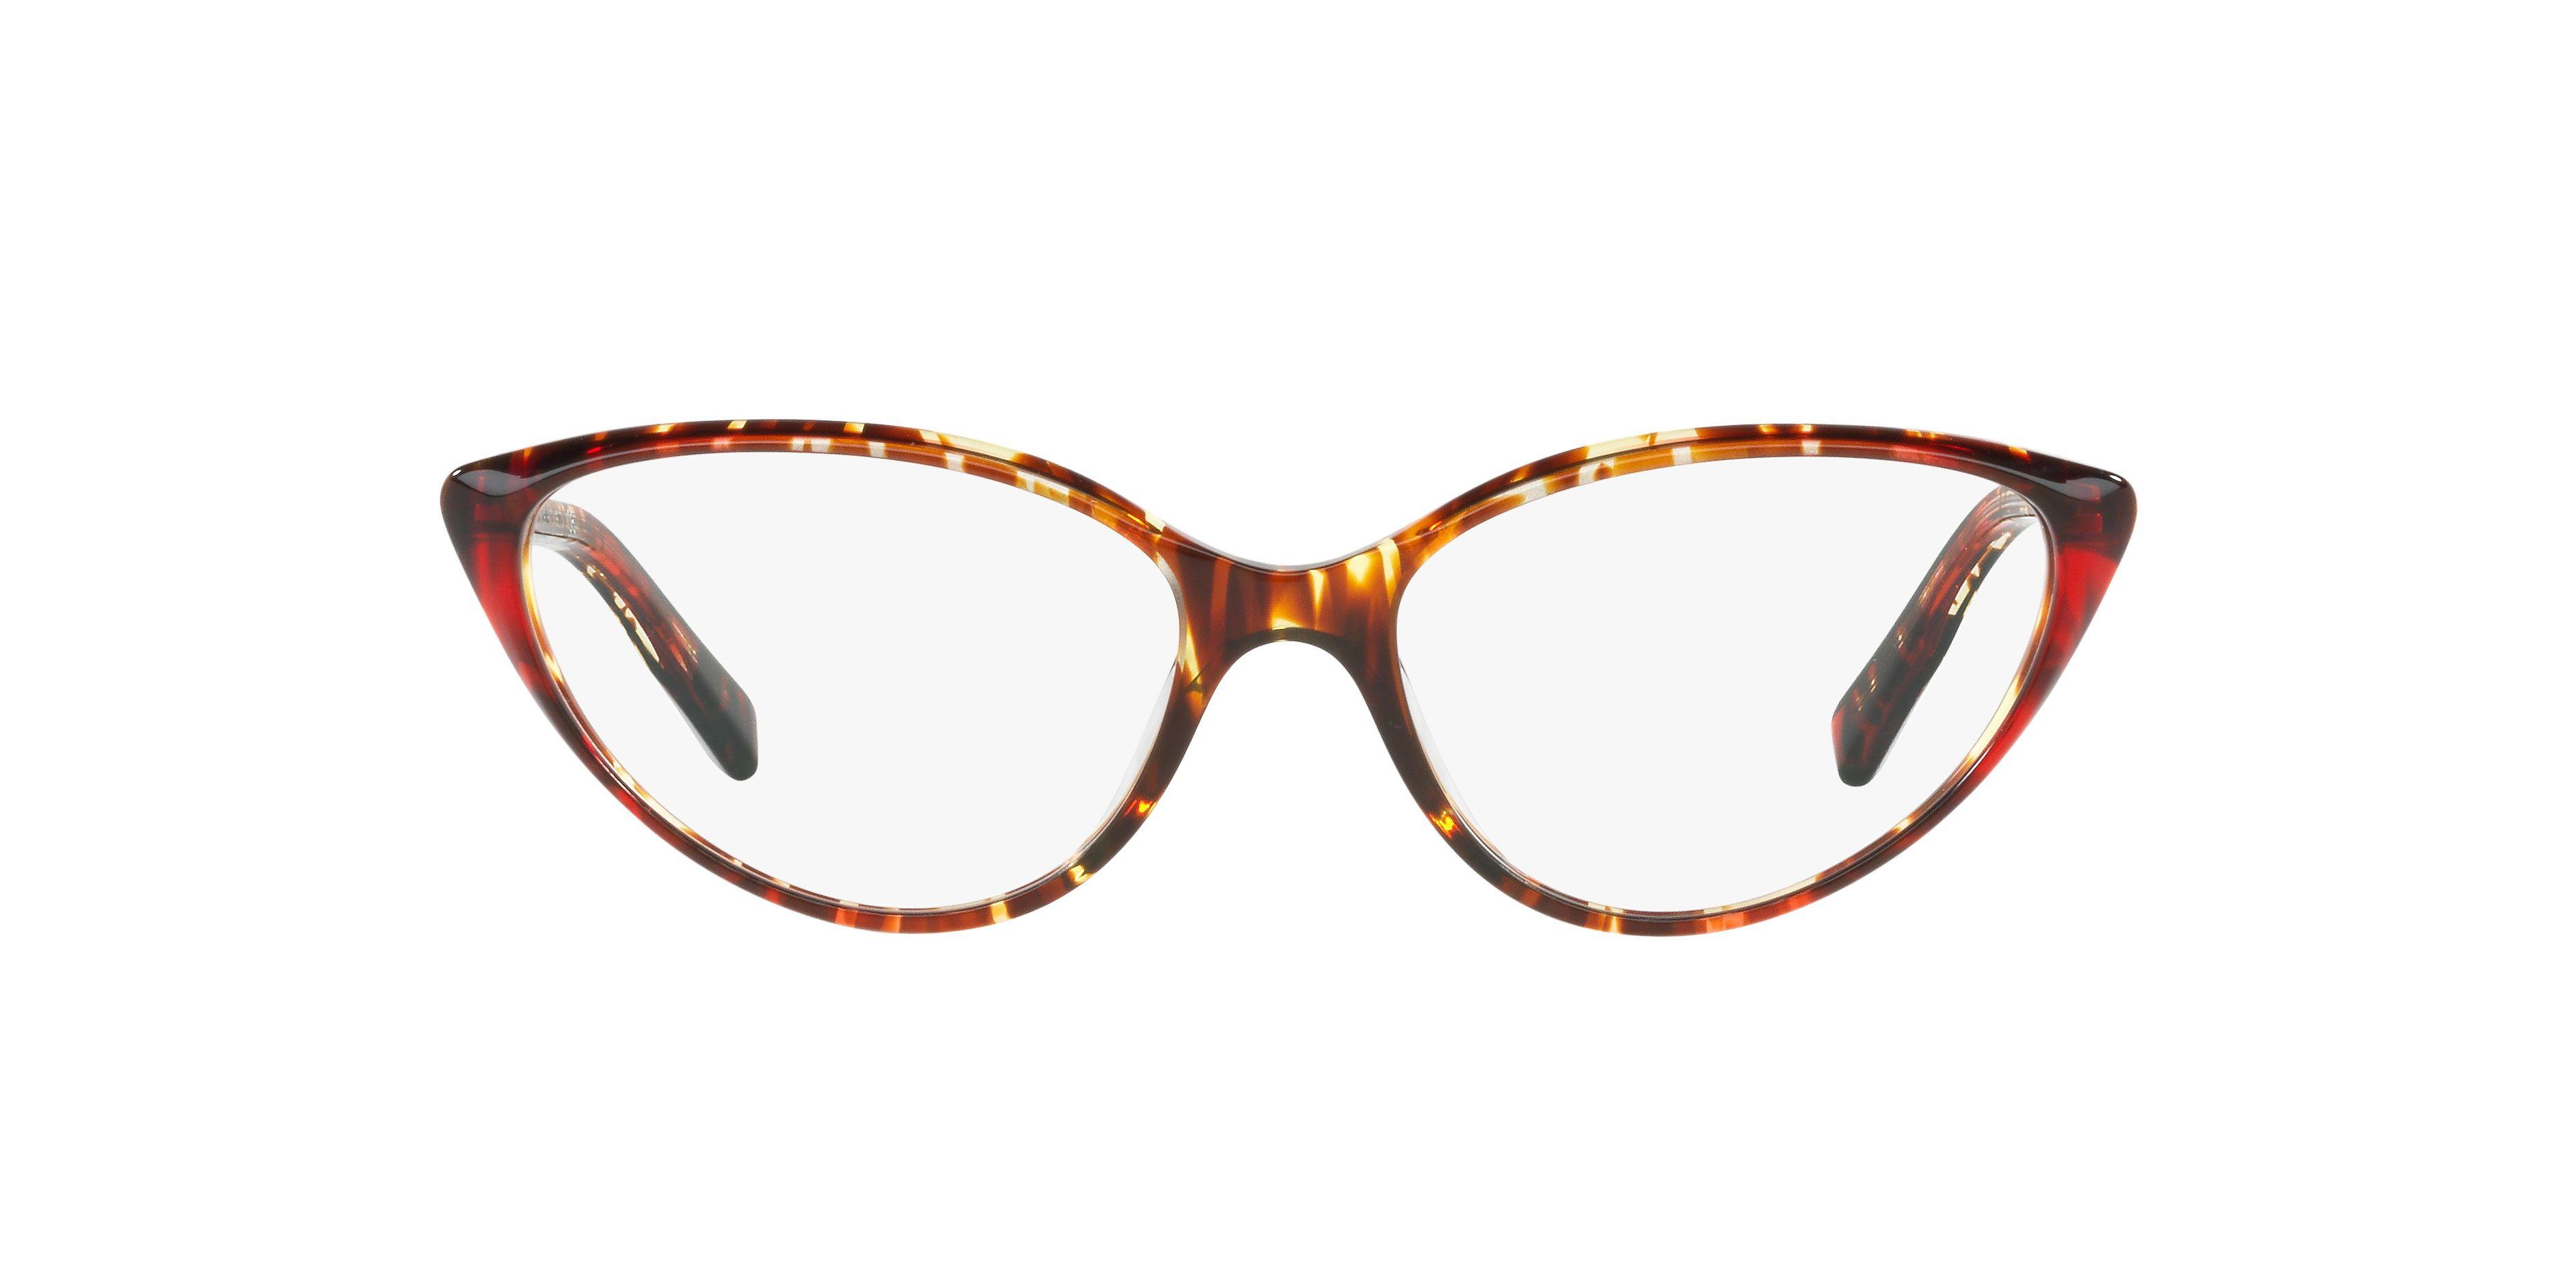 0614bbed93e2f1 a03081 – Alain Mikli   Super Spectacles